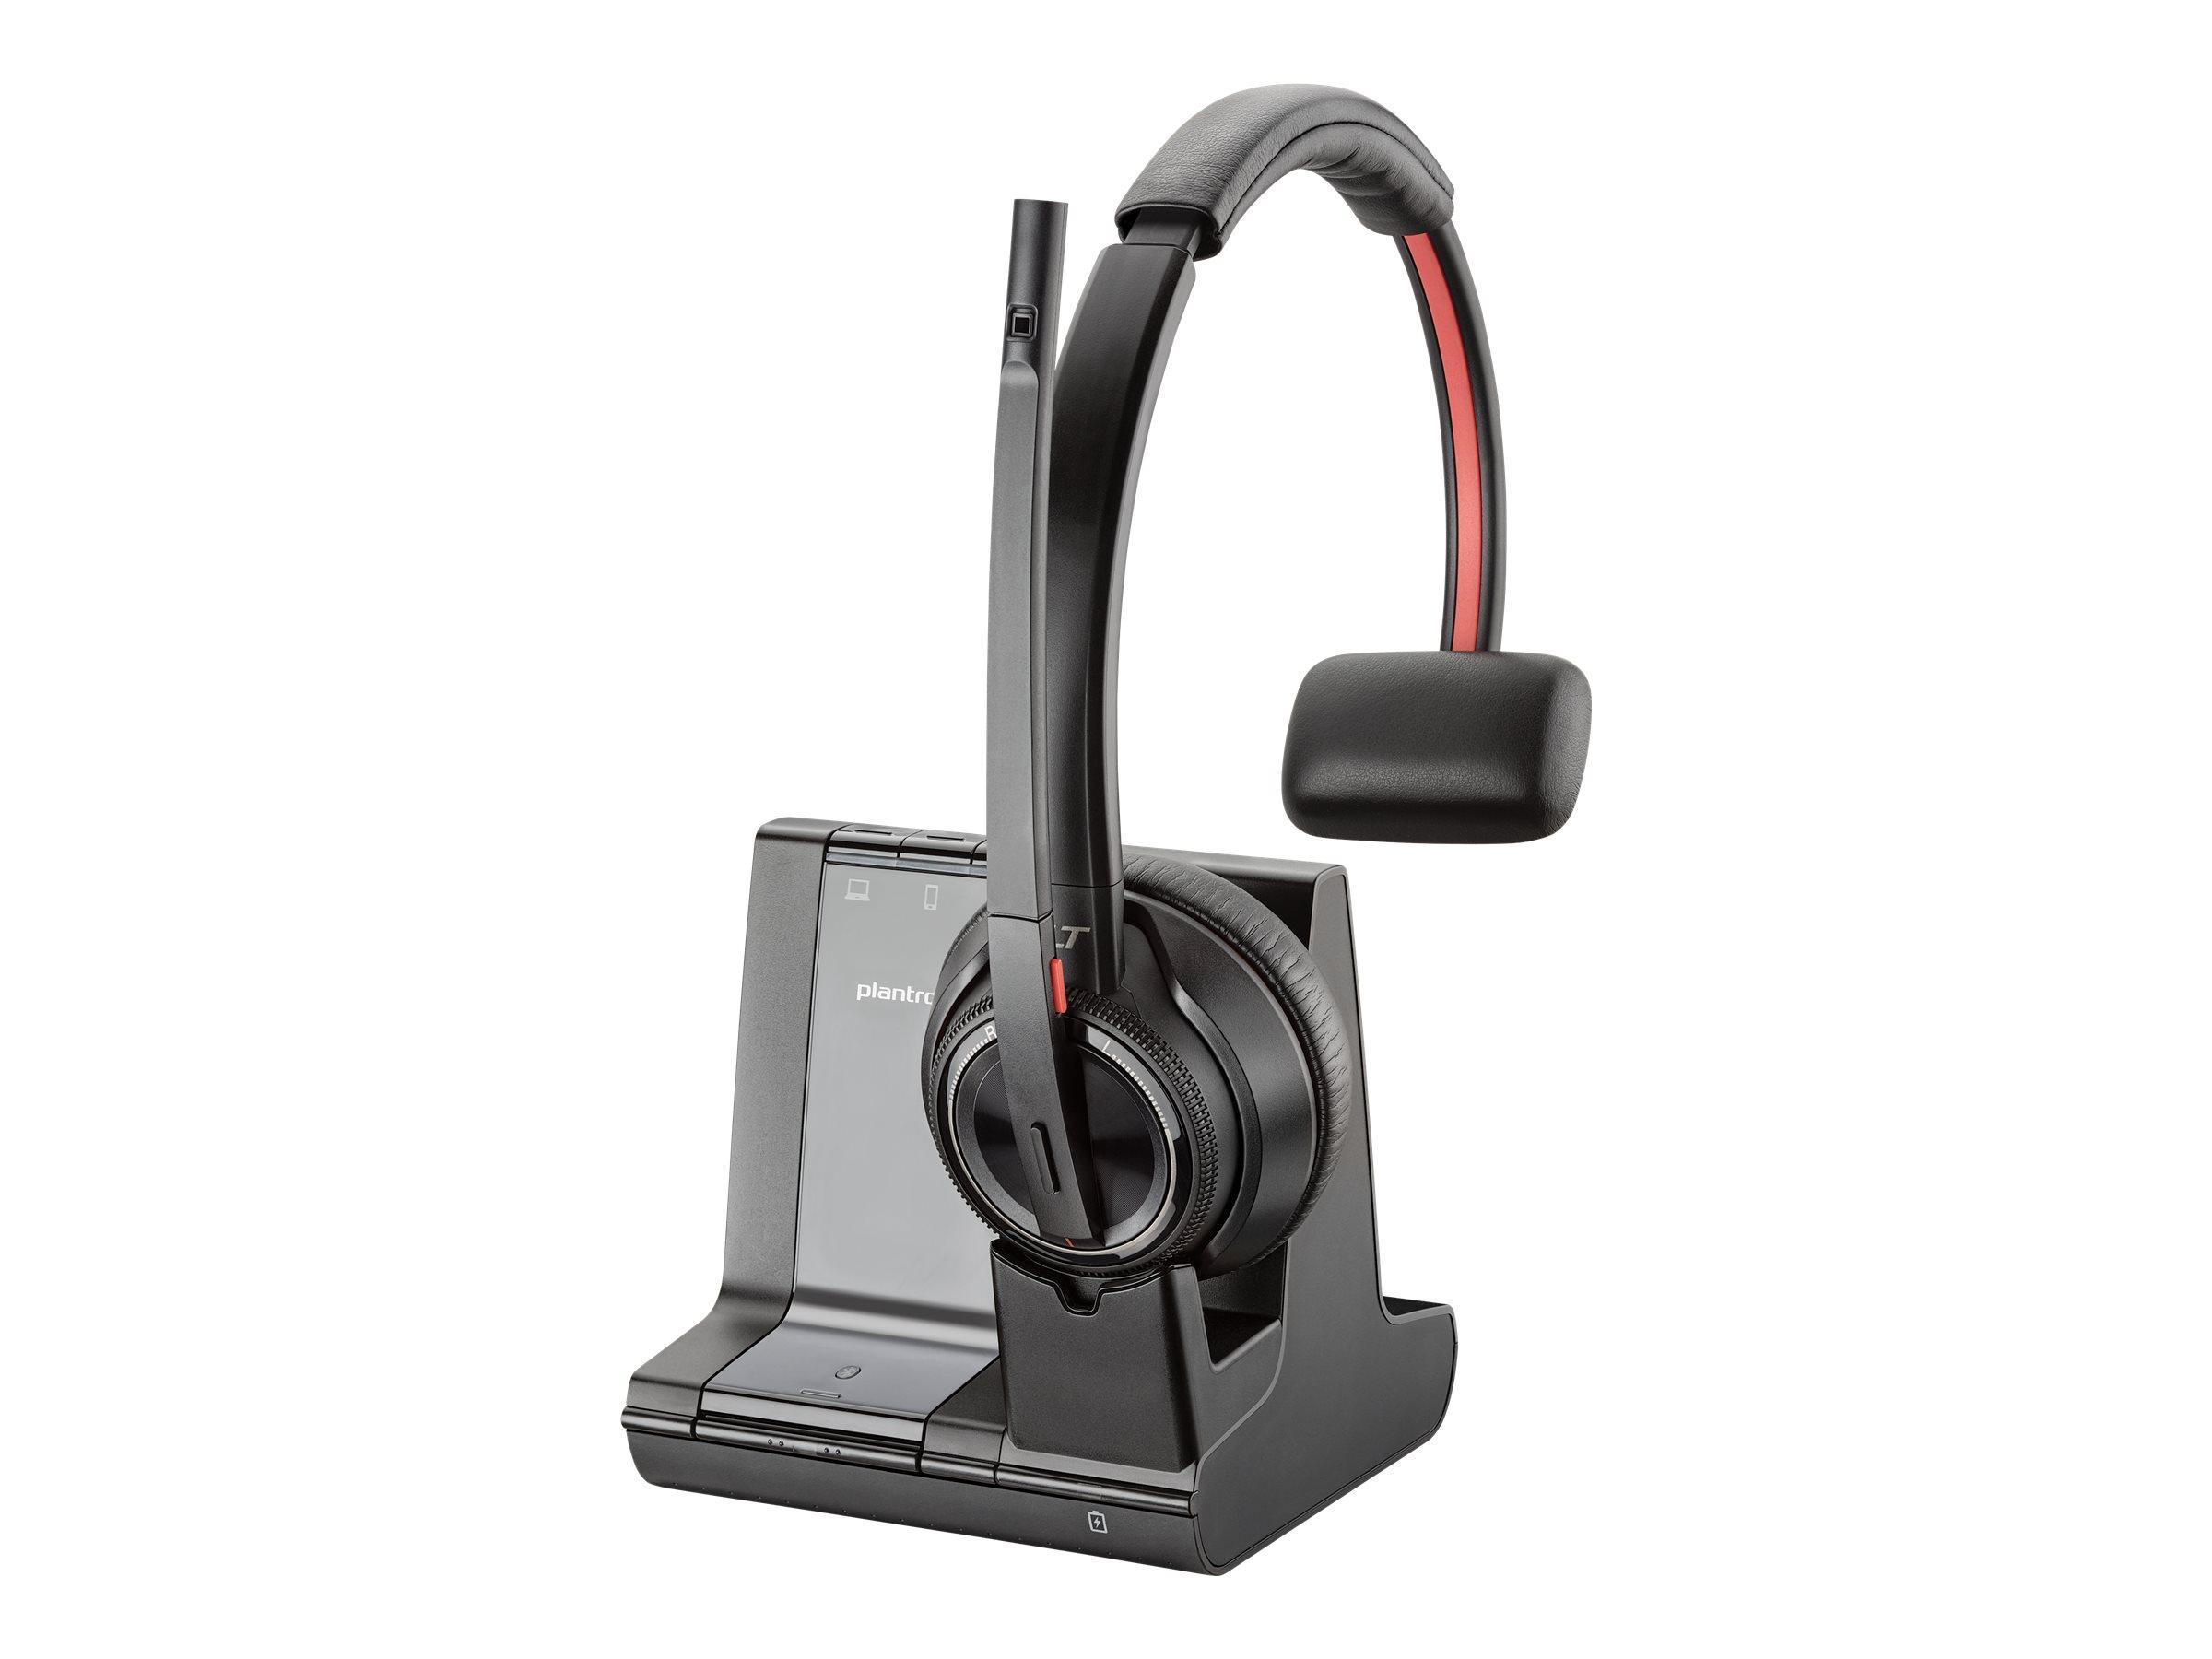 Plantronics Savi 8200 Series W8210 - Headset - On-Ear - DECT 6.0 / Bluetooth - kabellos - aktive Rauschunterdrückung